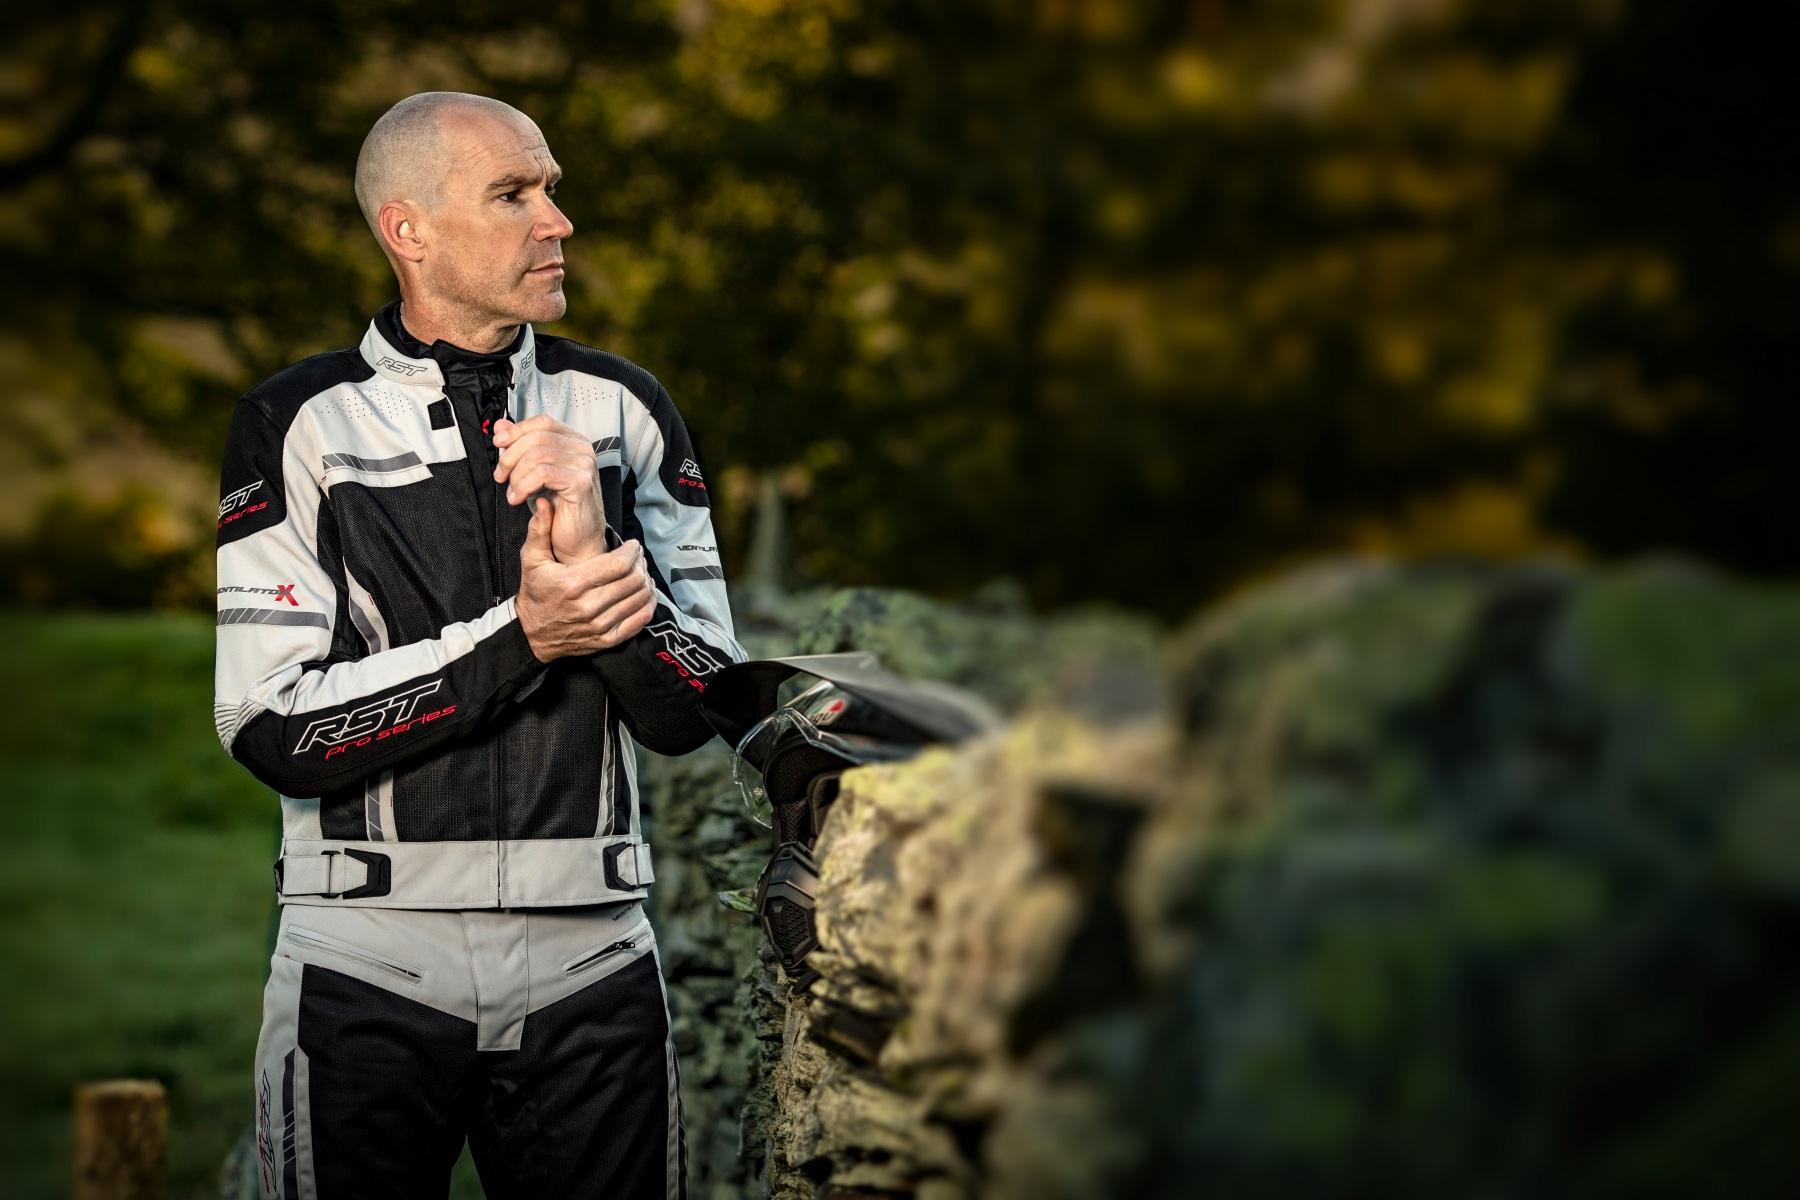 102367-rst-pro-series-ventilator-x-jacket-silver-lifestyle-01